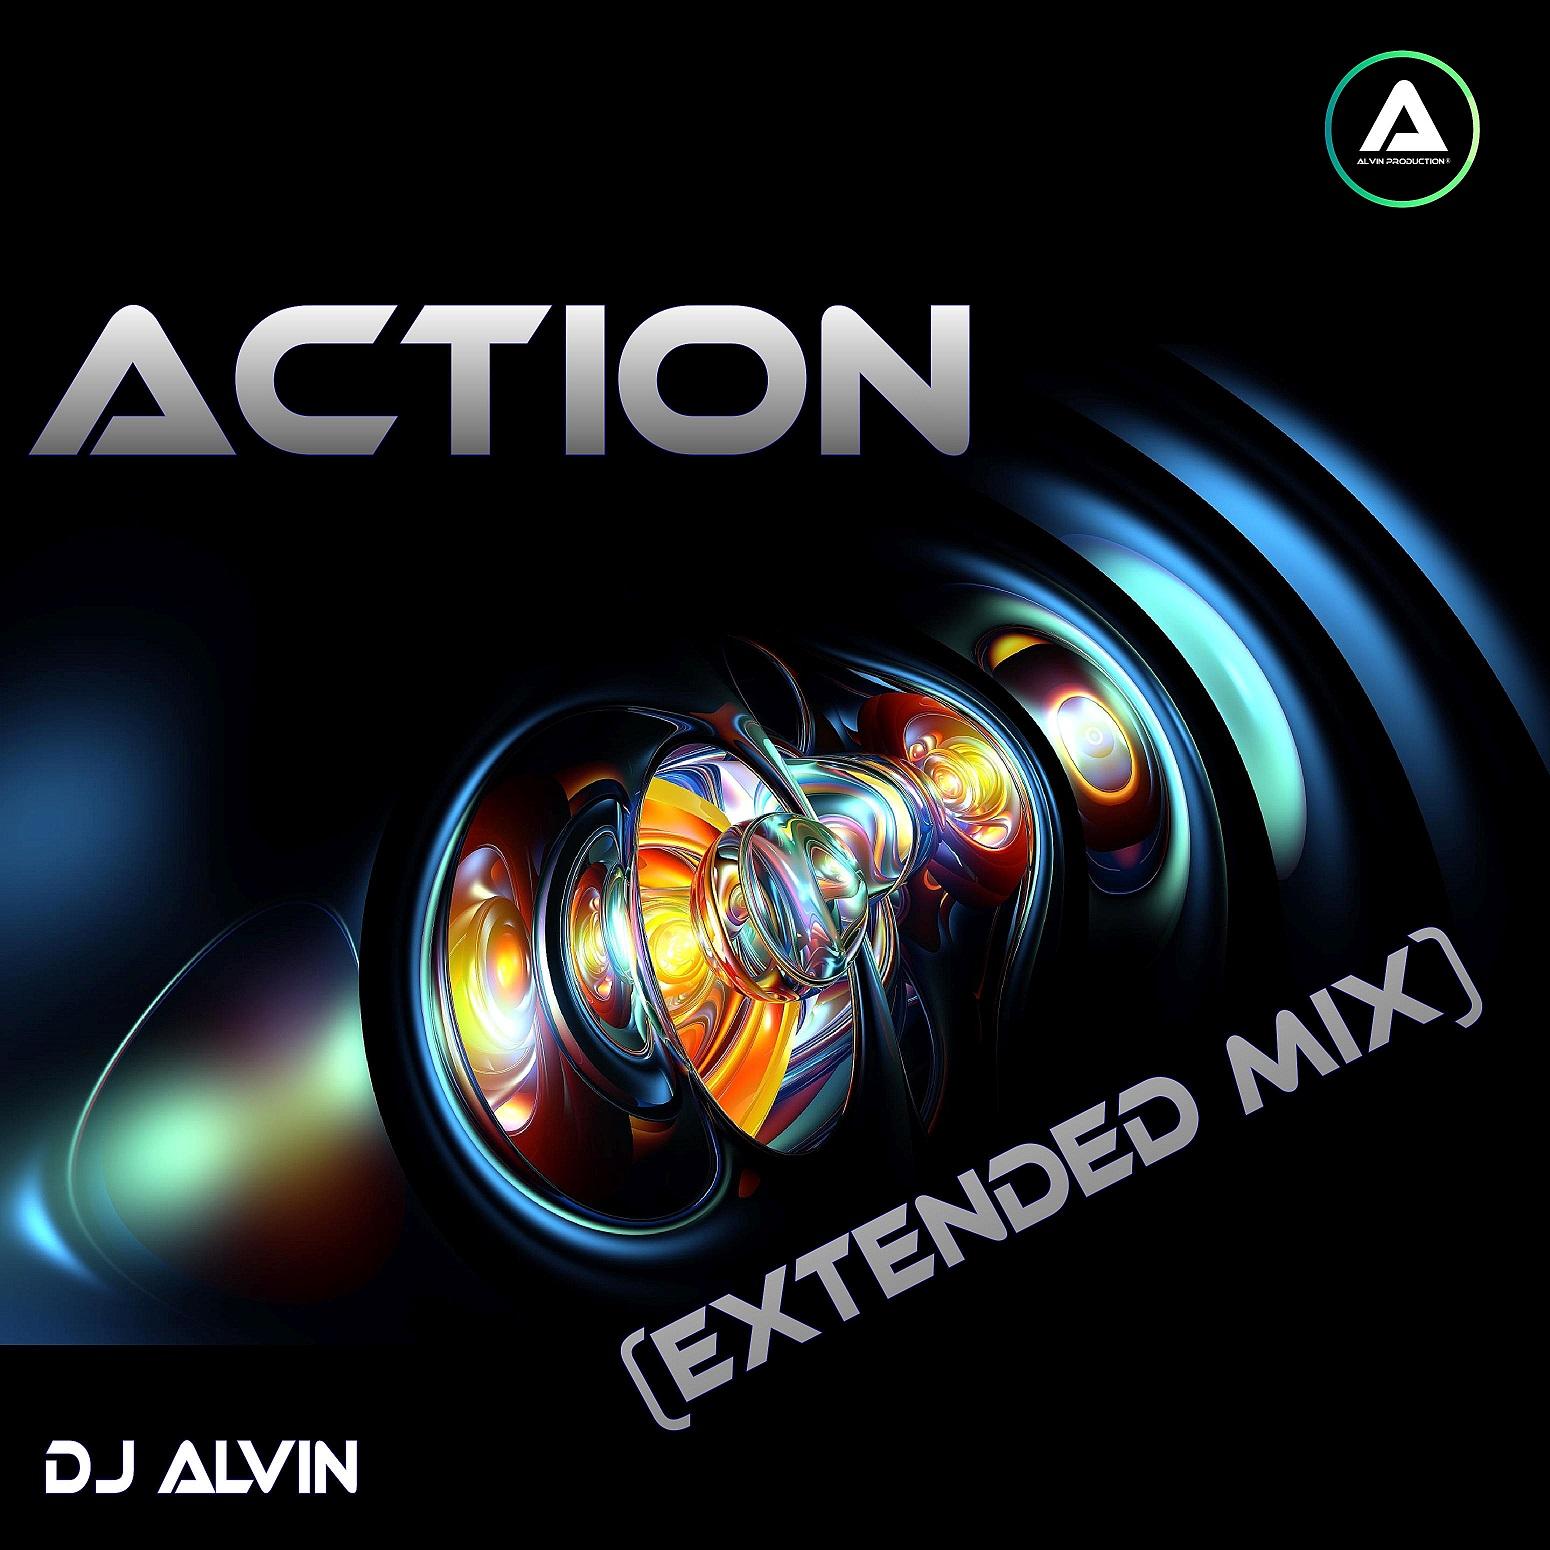 ALVIN-PRODUCTION ® - DJ Alvin - Action (Extended Mix)